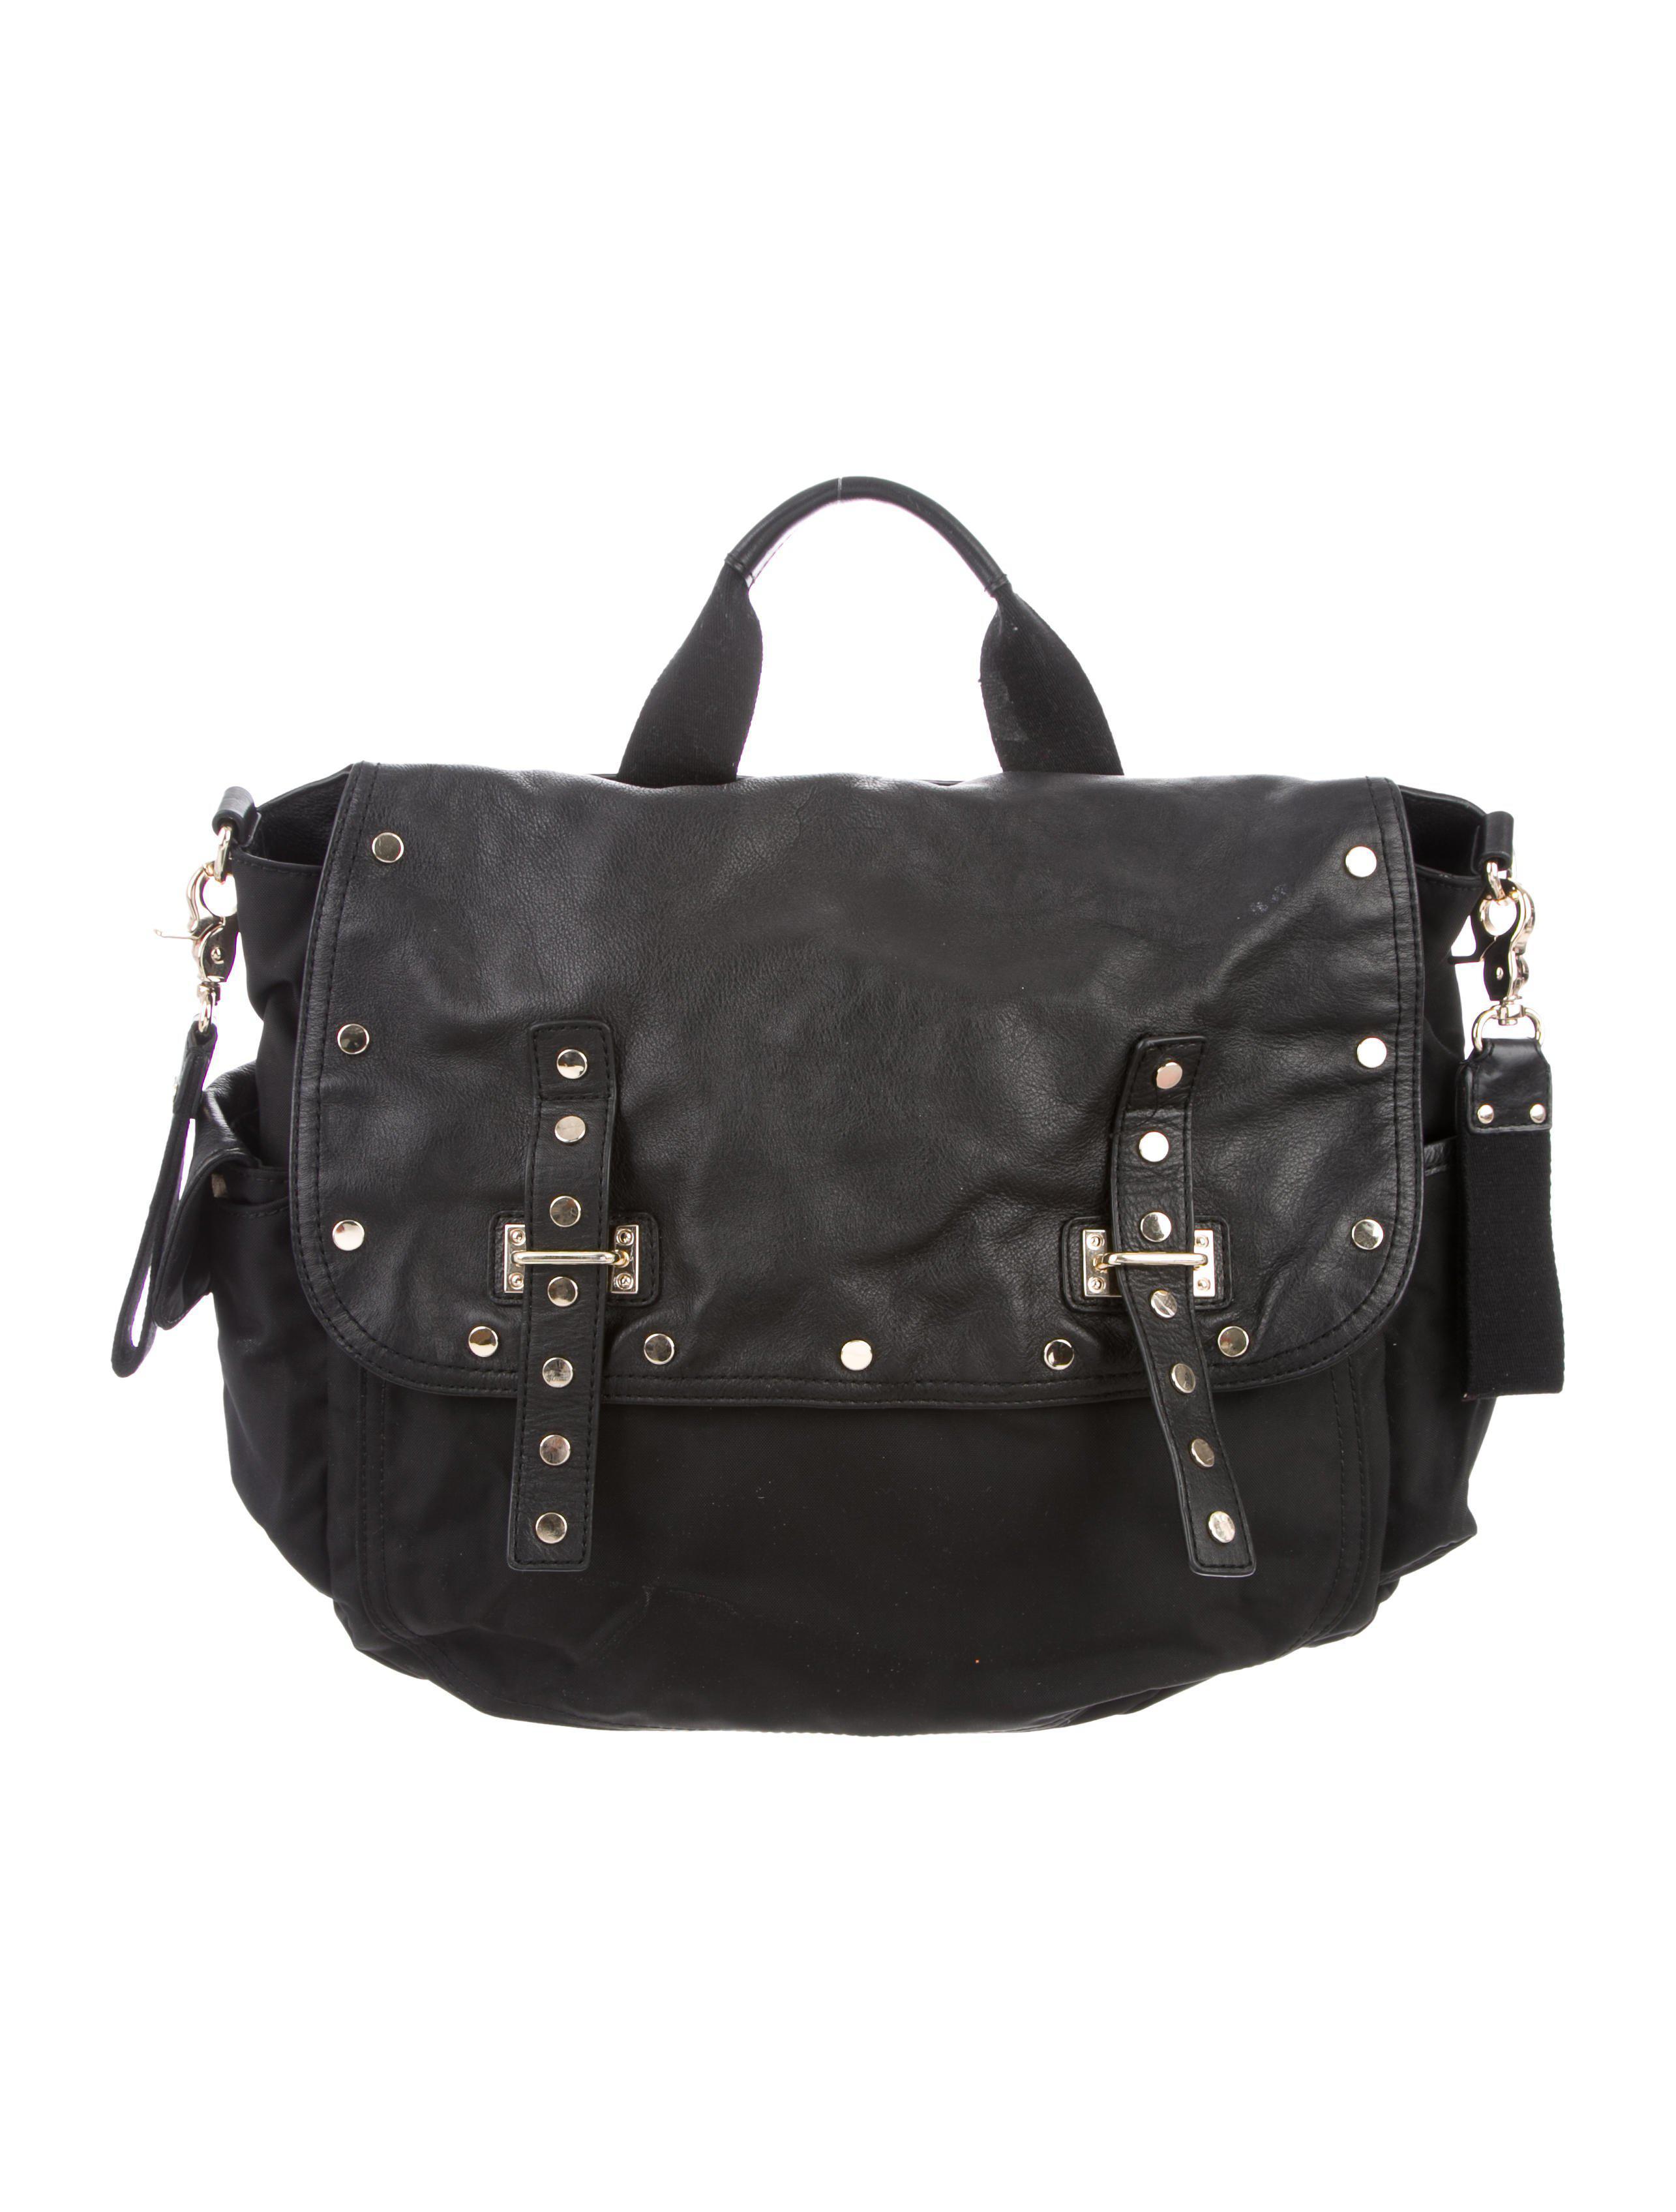 Rebecca Minkoff Women S Metallic Leather Trimmed Diaper Bag Black